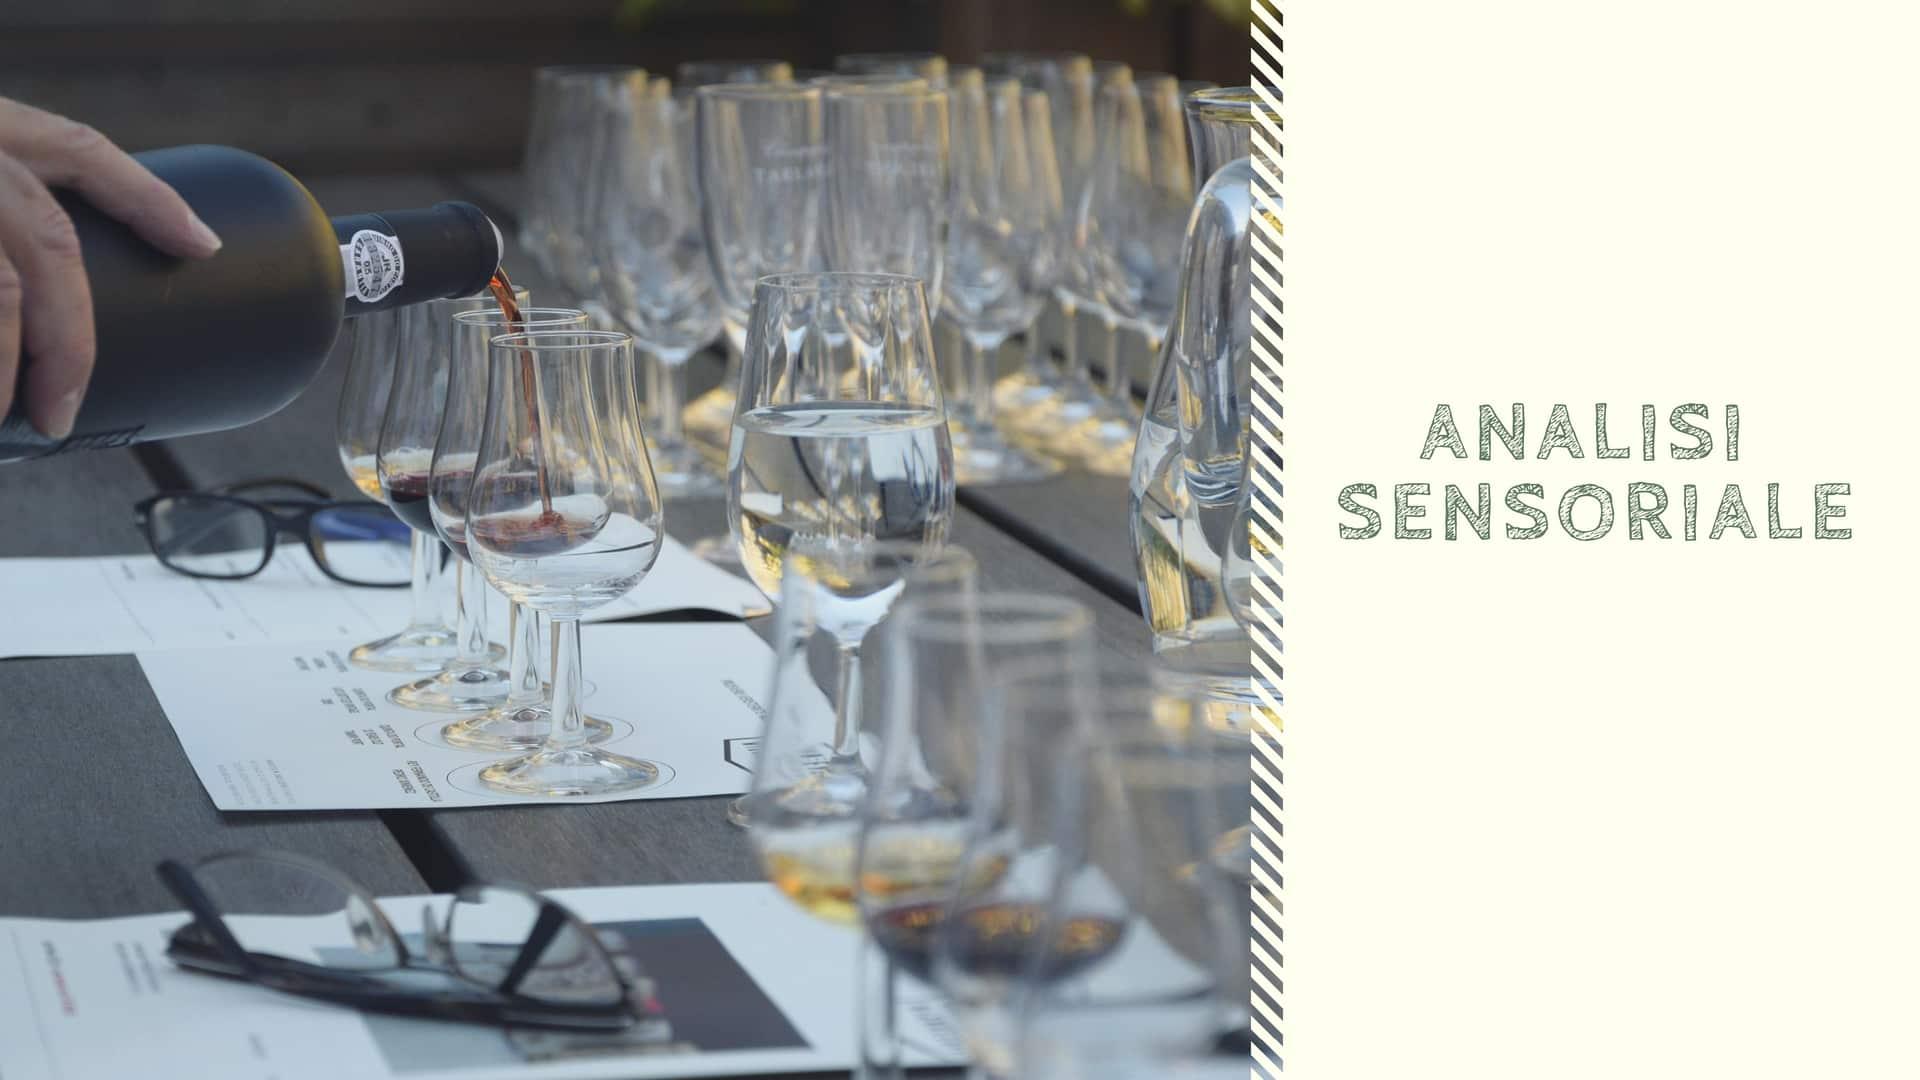 analisi sensoriale